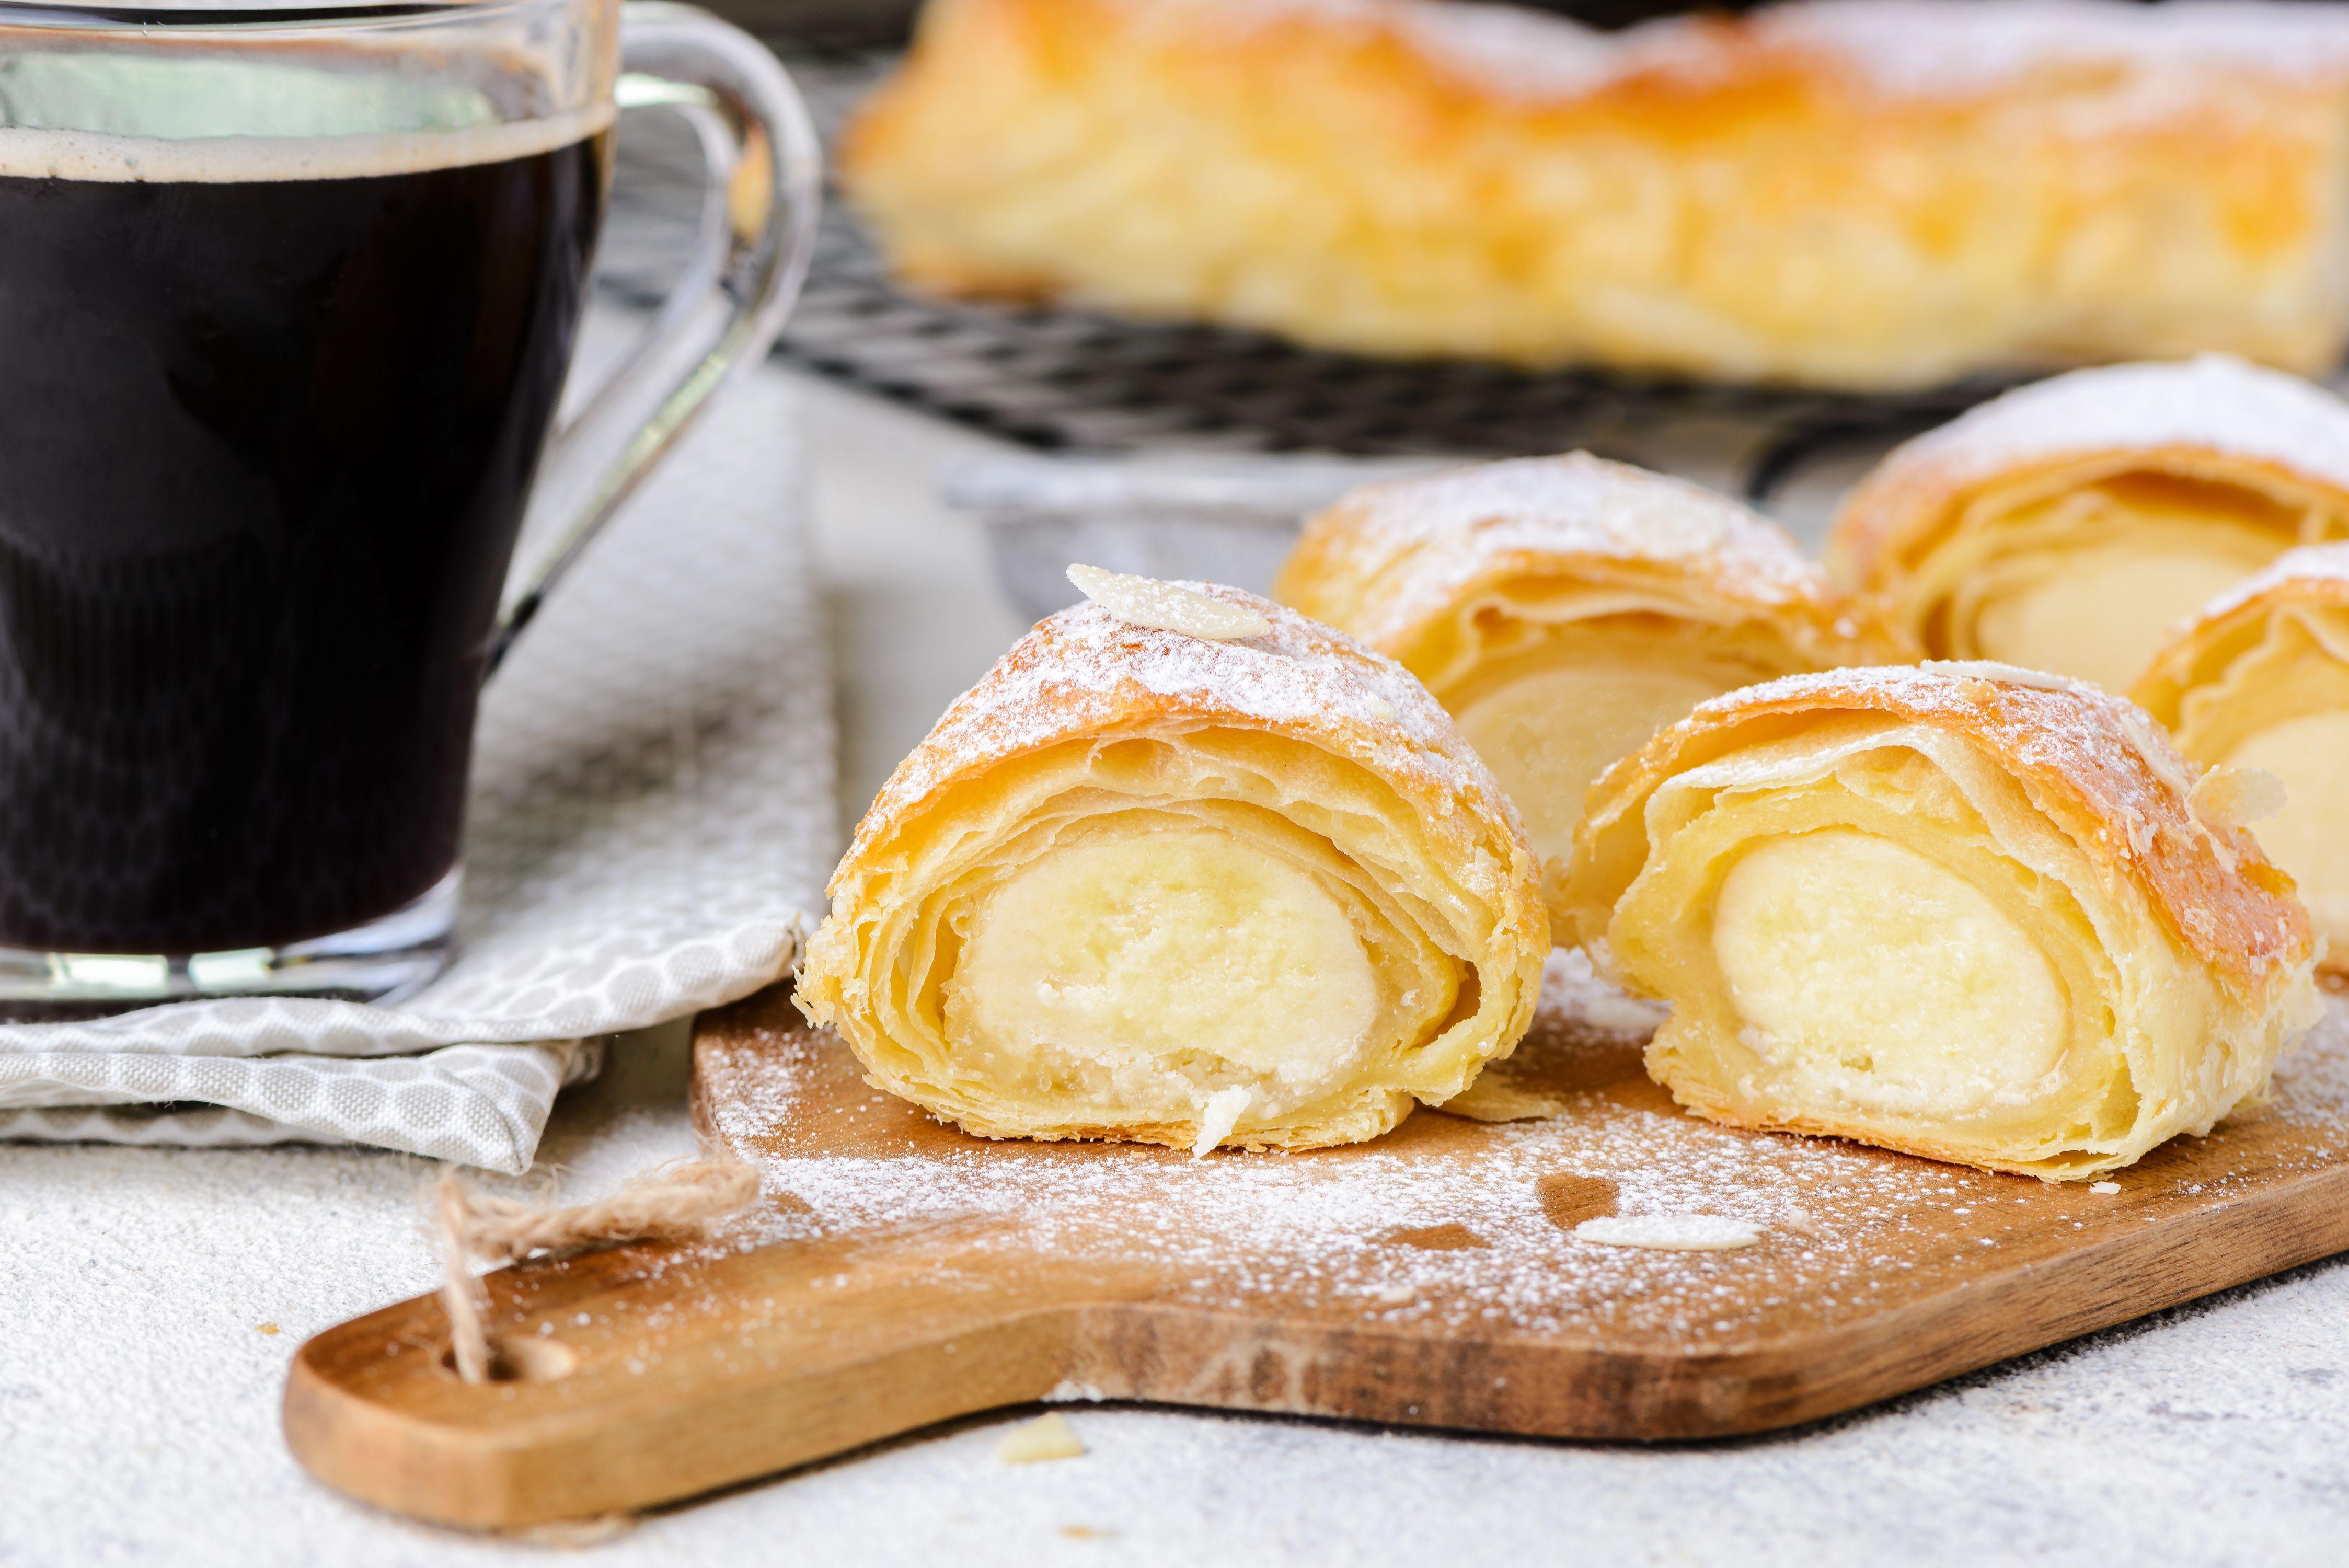 Sliced Dutch Almond Paste-Filled Pastry Log (Banketstaaf)